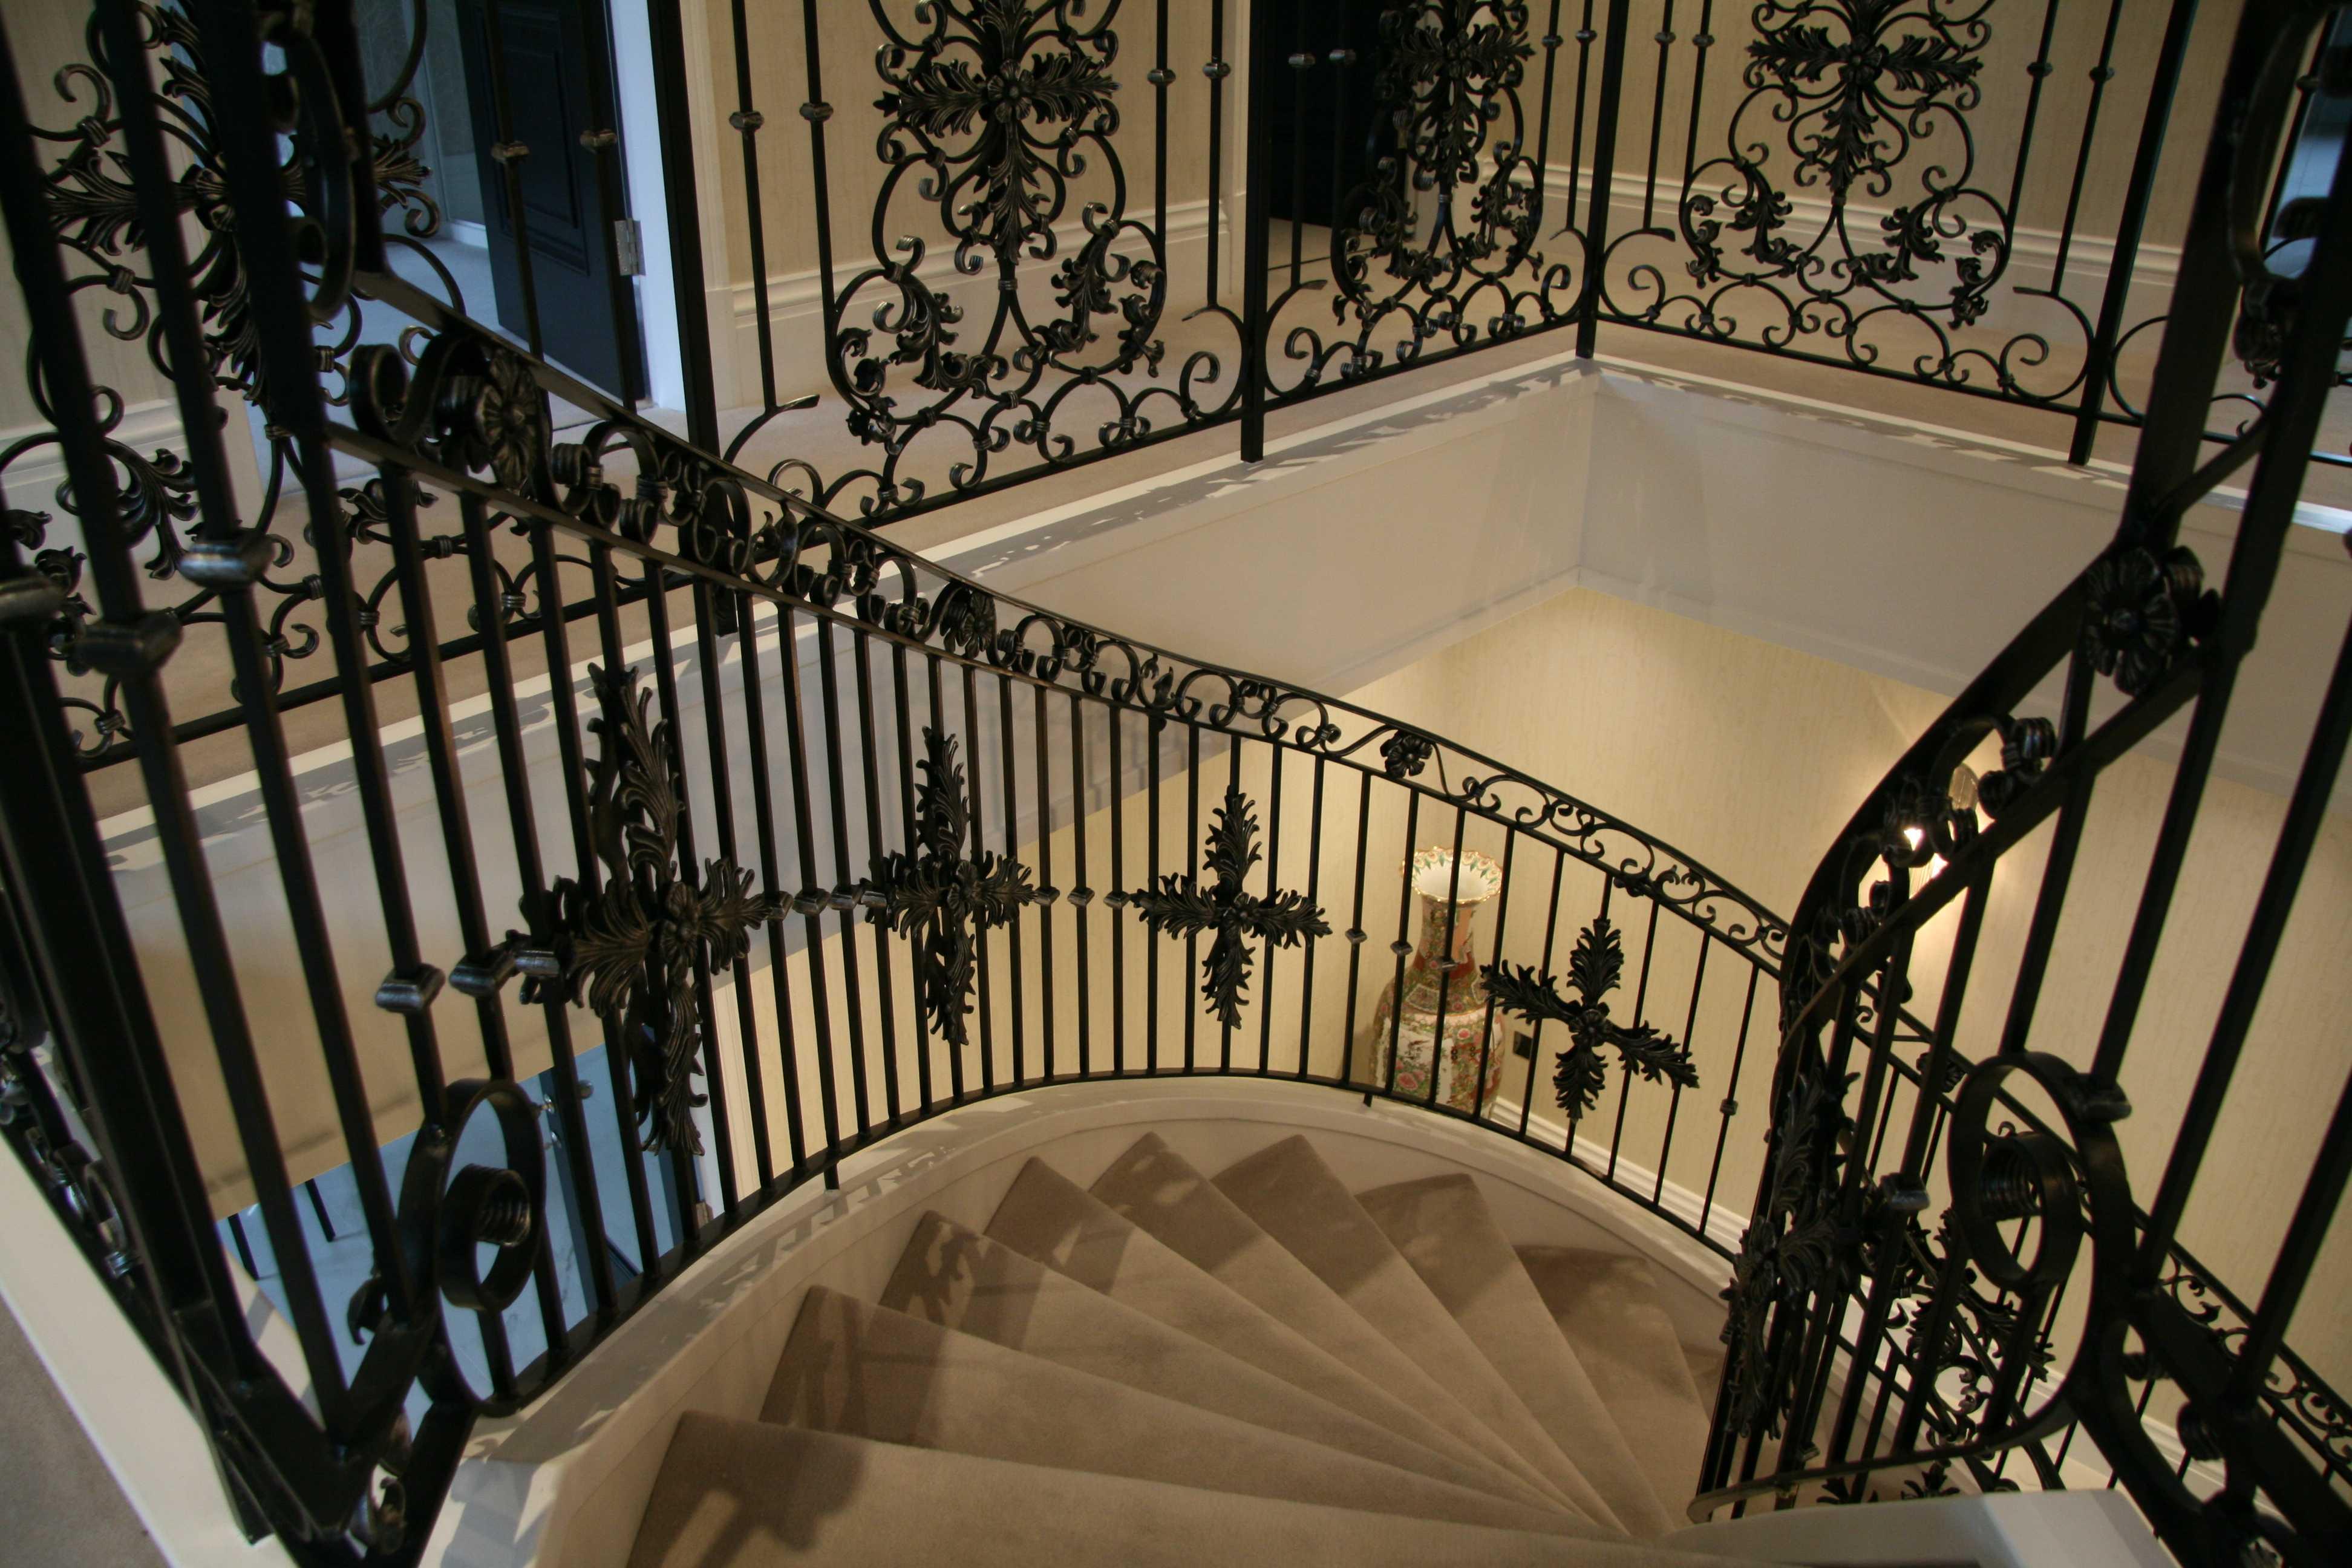 Modern metal stair railings interior bespoke staircases designs for sale--IOK-167